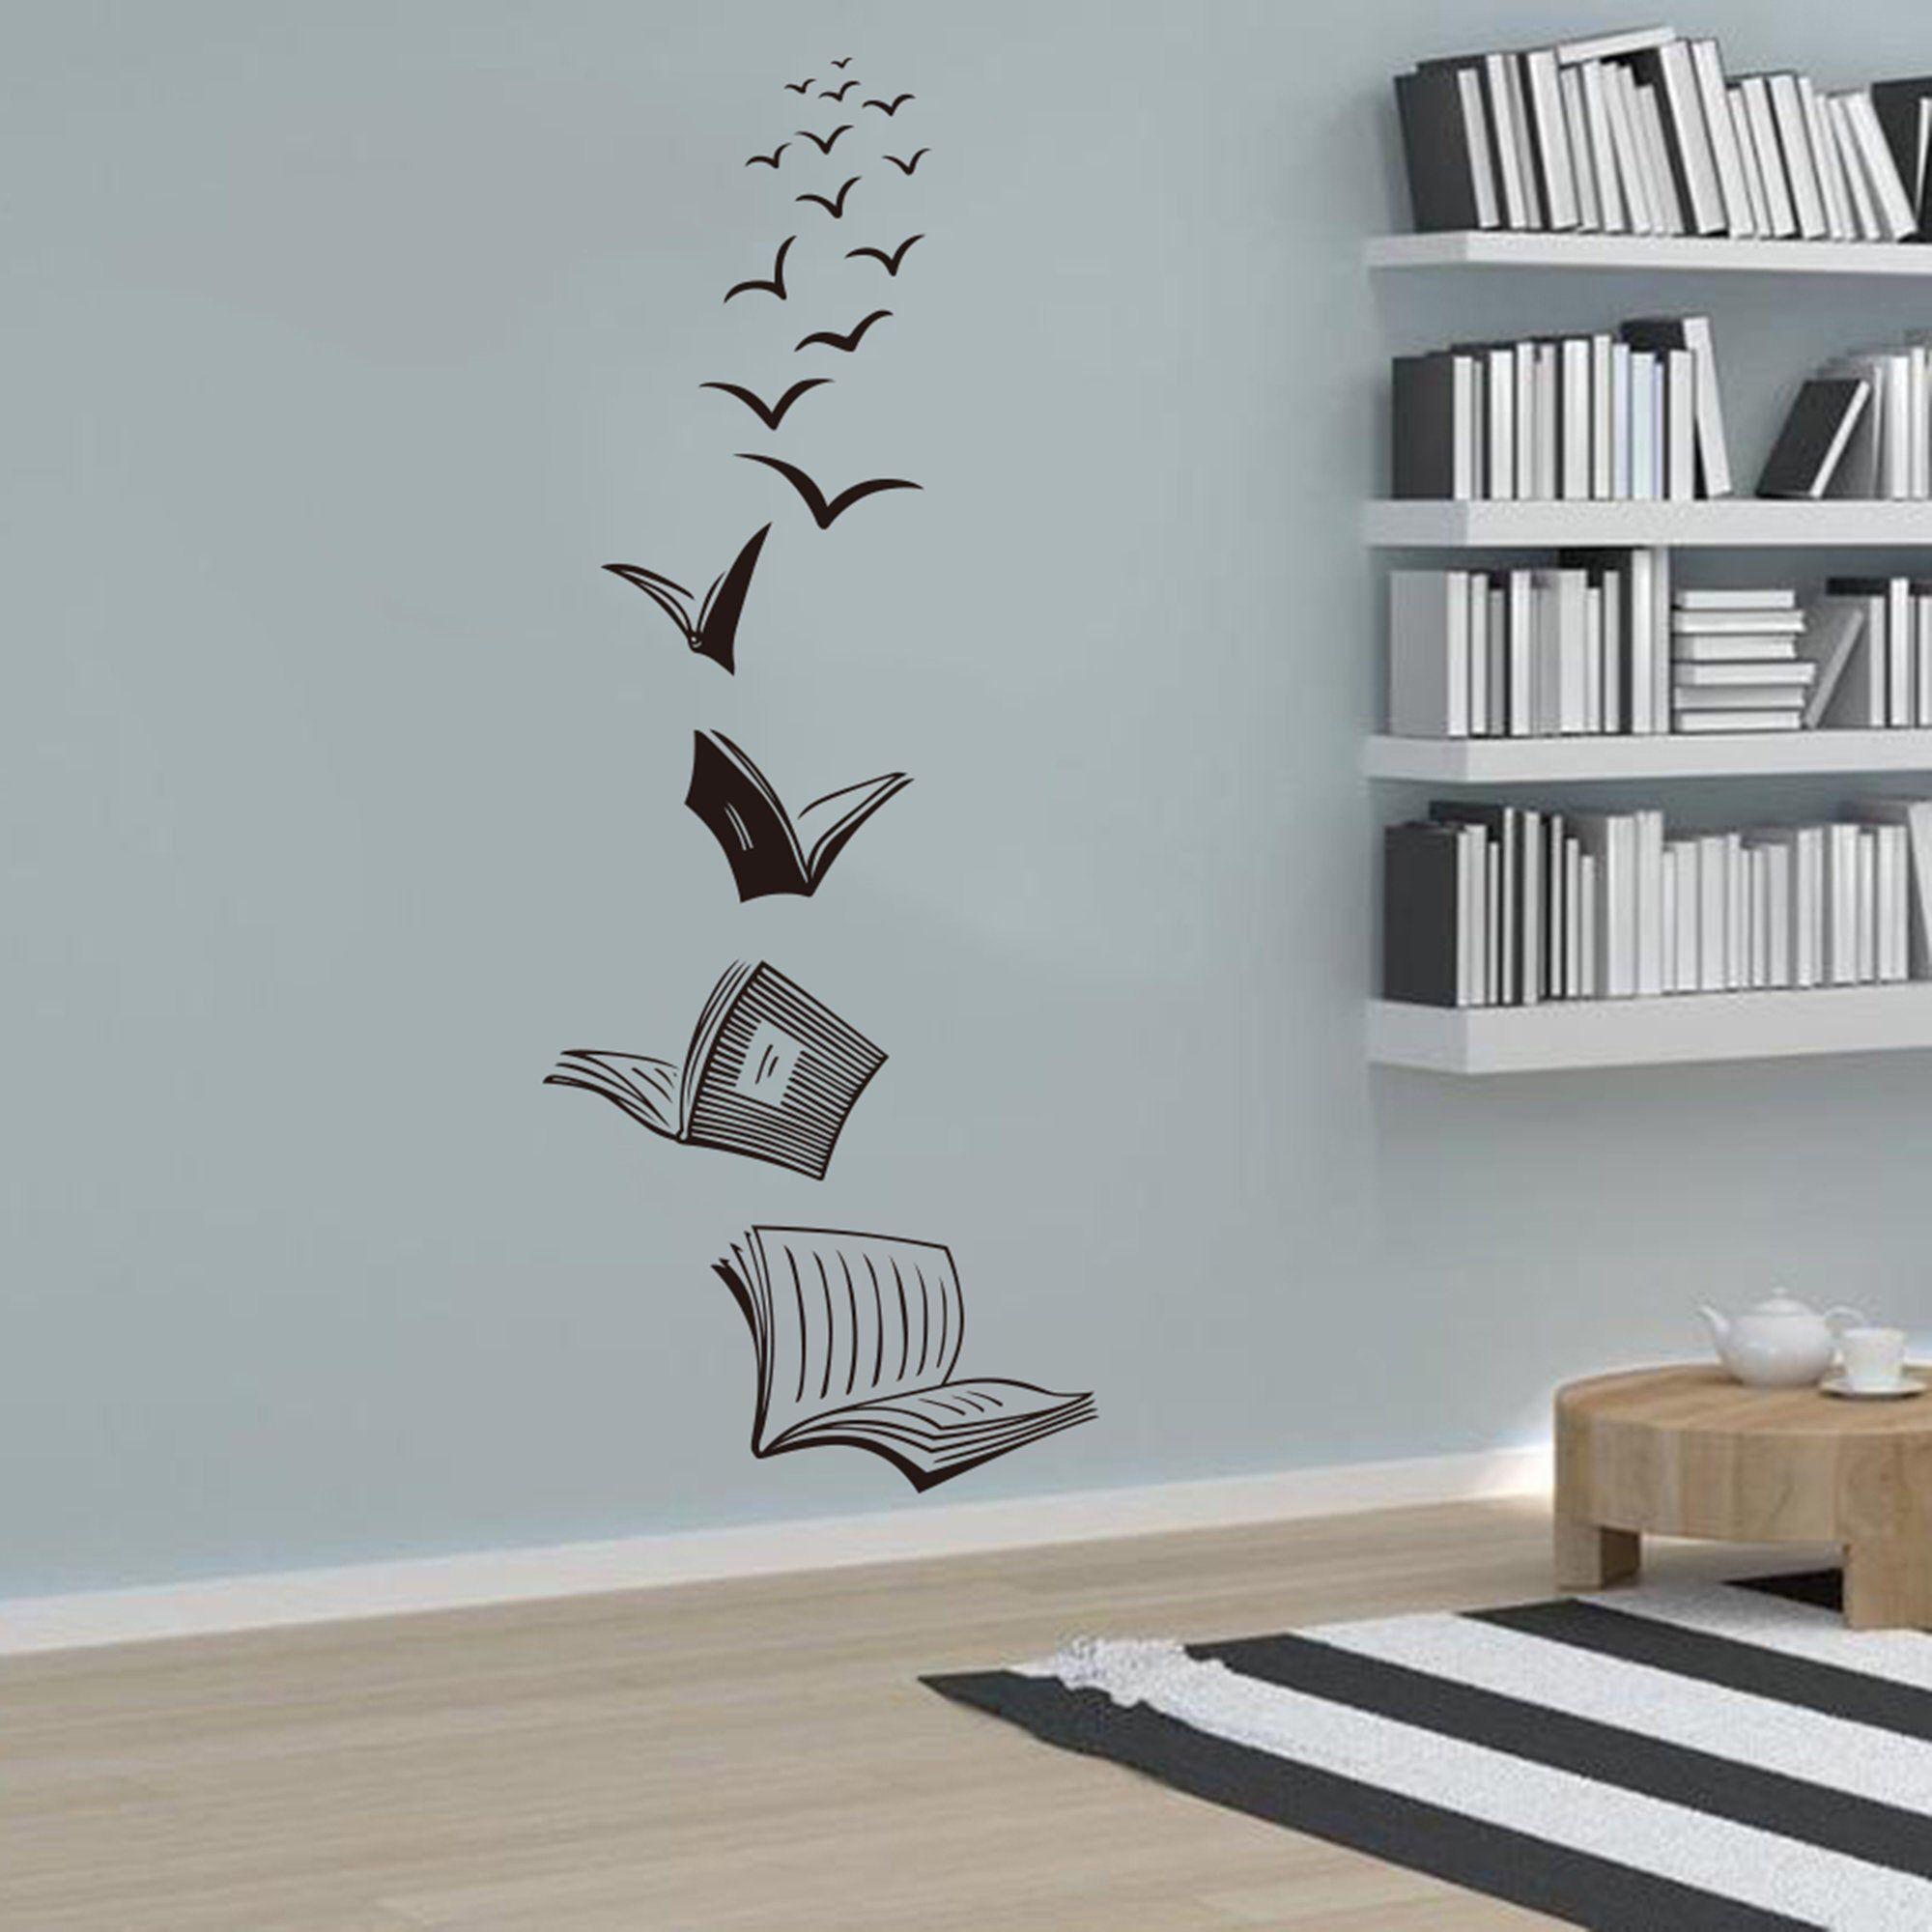 Reading Book Fly Birds Wall Decal Library School Classroom Decal Book Study Room Vinyl Wall Sticker Bed In 2020 Bird Wall Decals Wall Stickers Bedroom Bedroom Wall Art